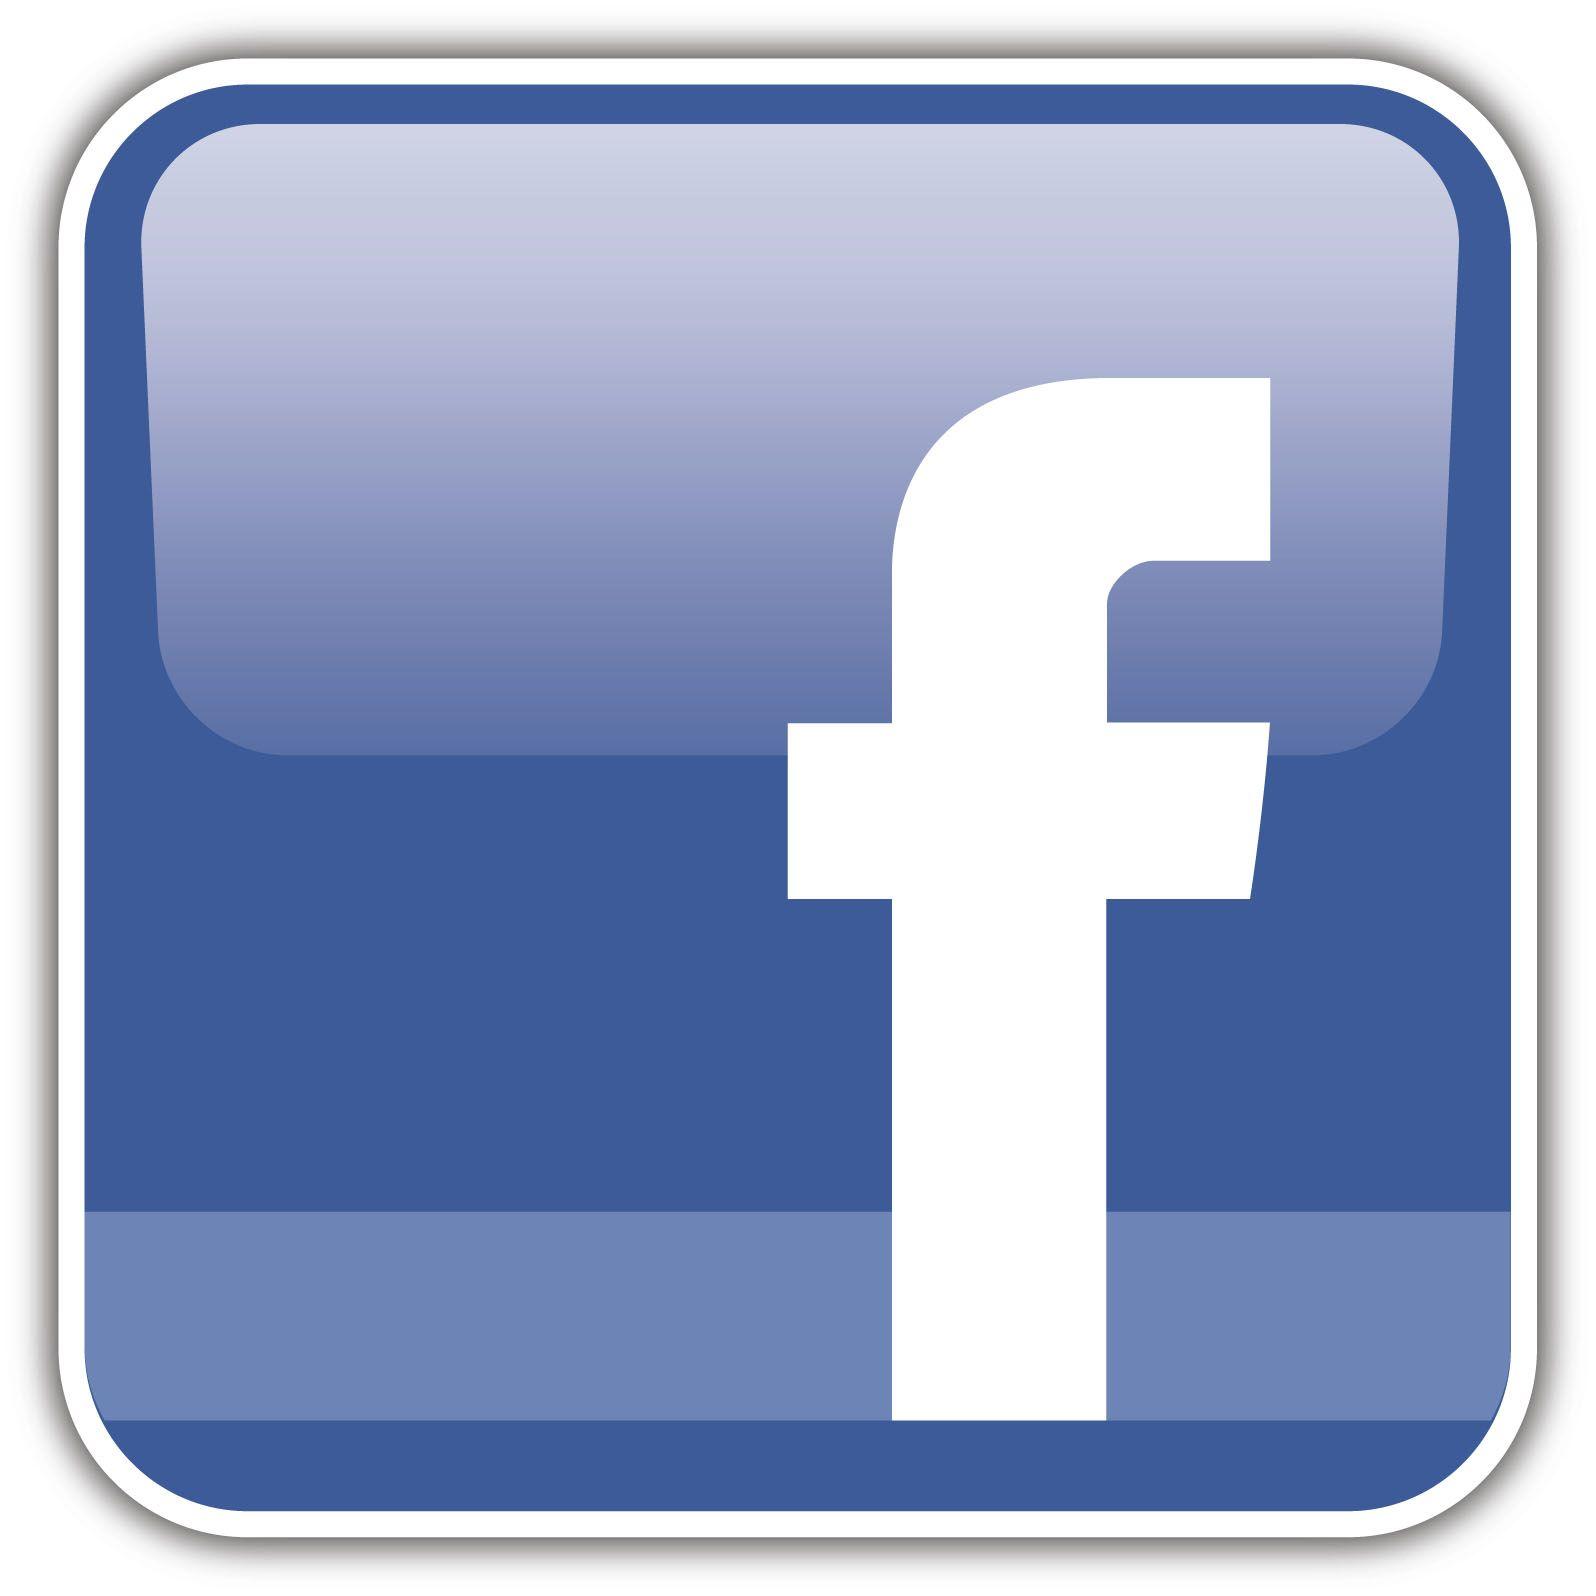 Fb Logo Facebook Marketing How To Use Facebook Social Media